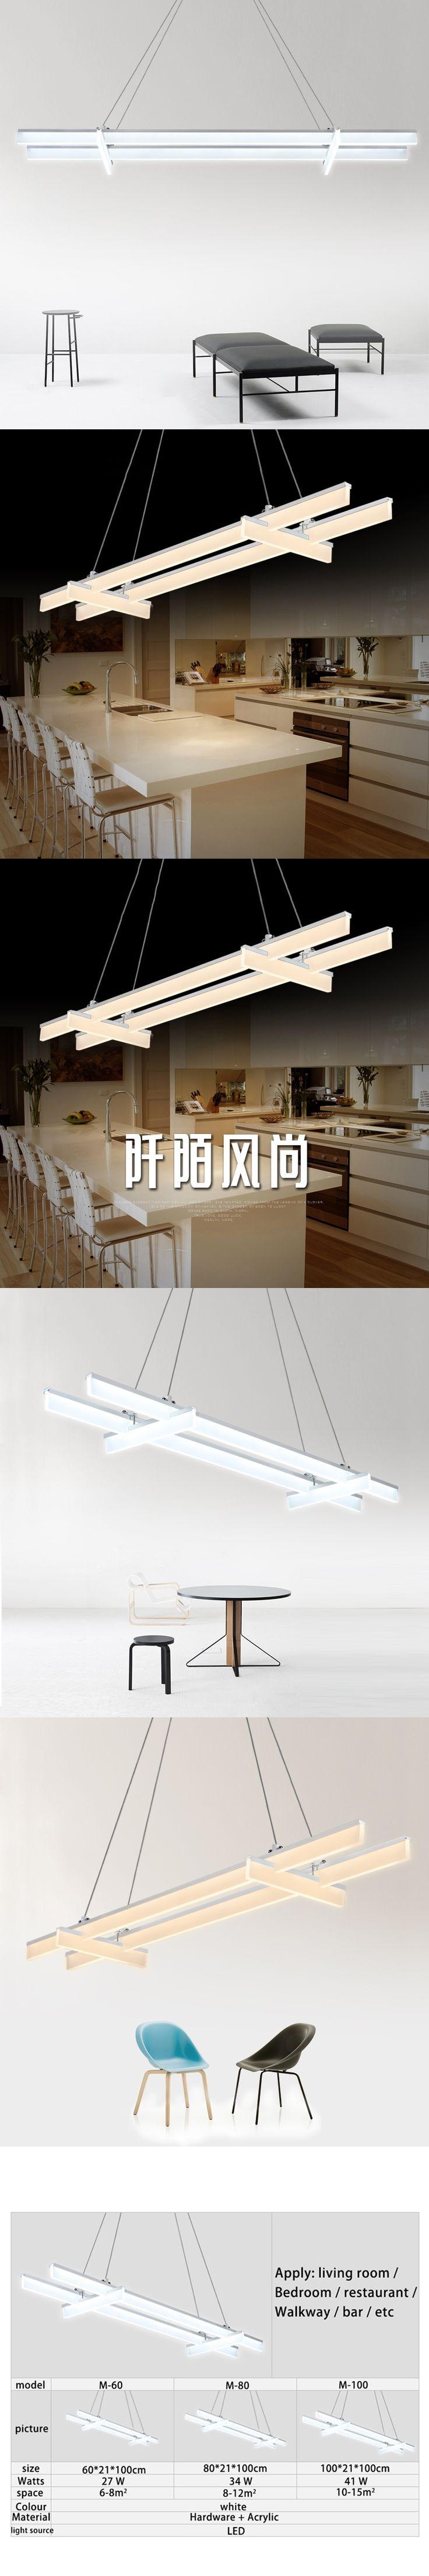 35 best LED 50w cob street light 500w halogen lamp images on ...